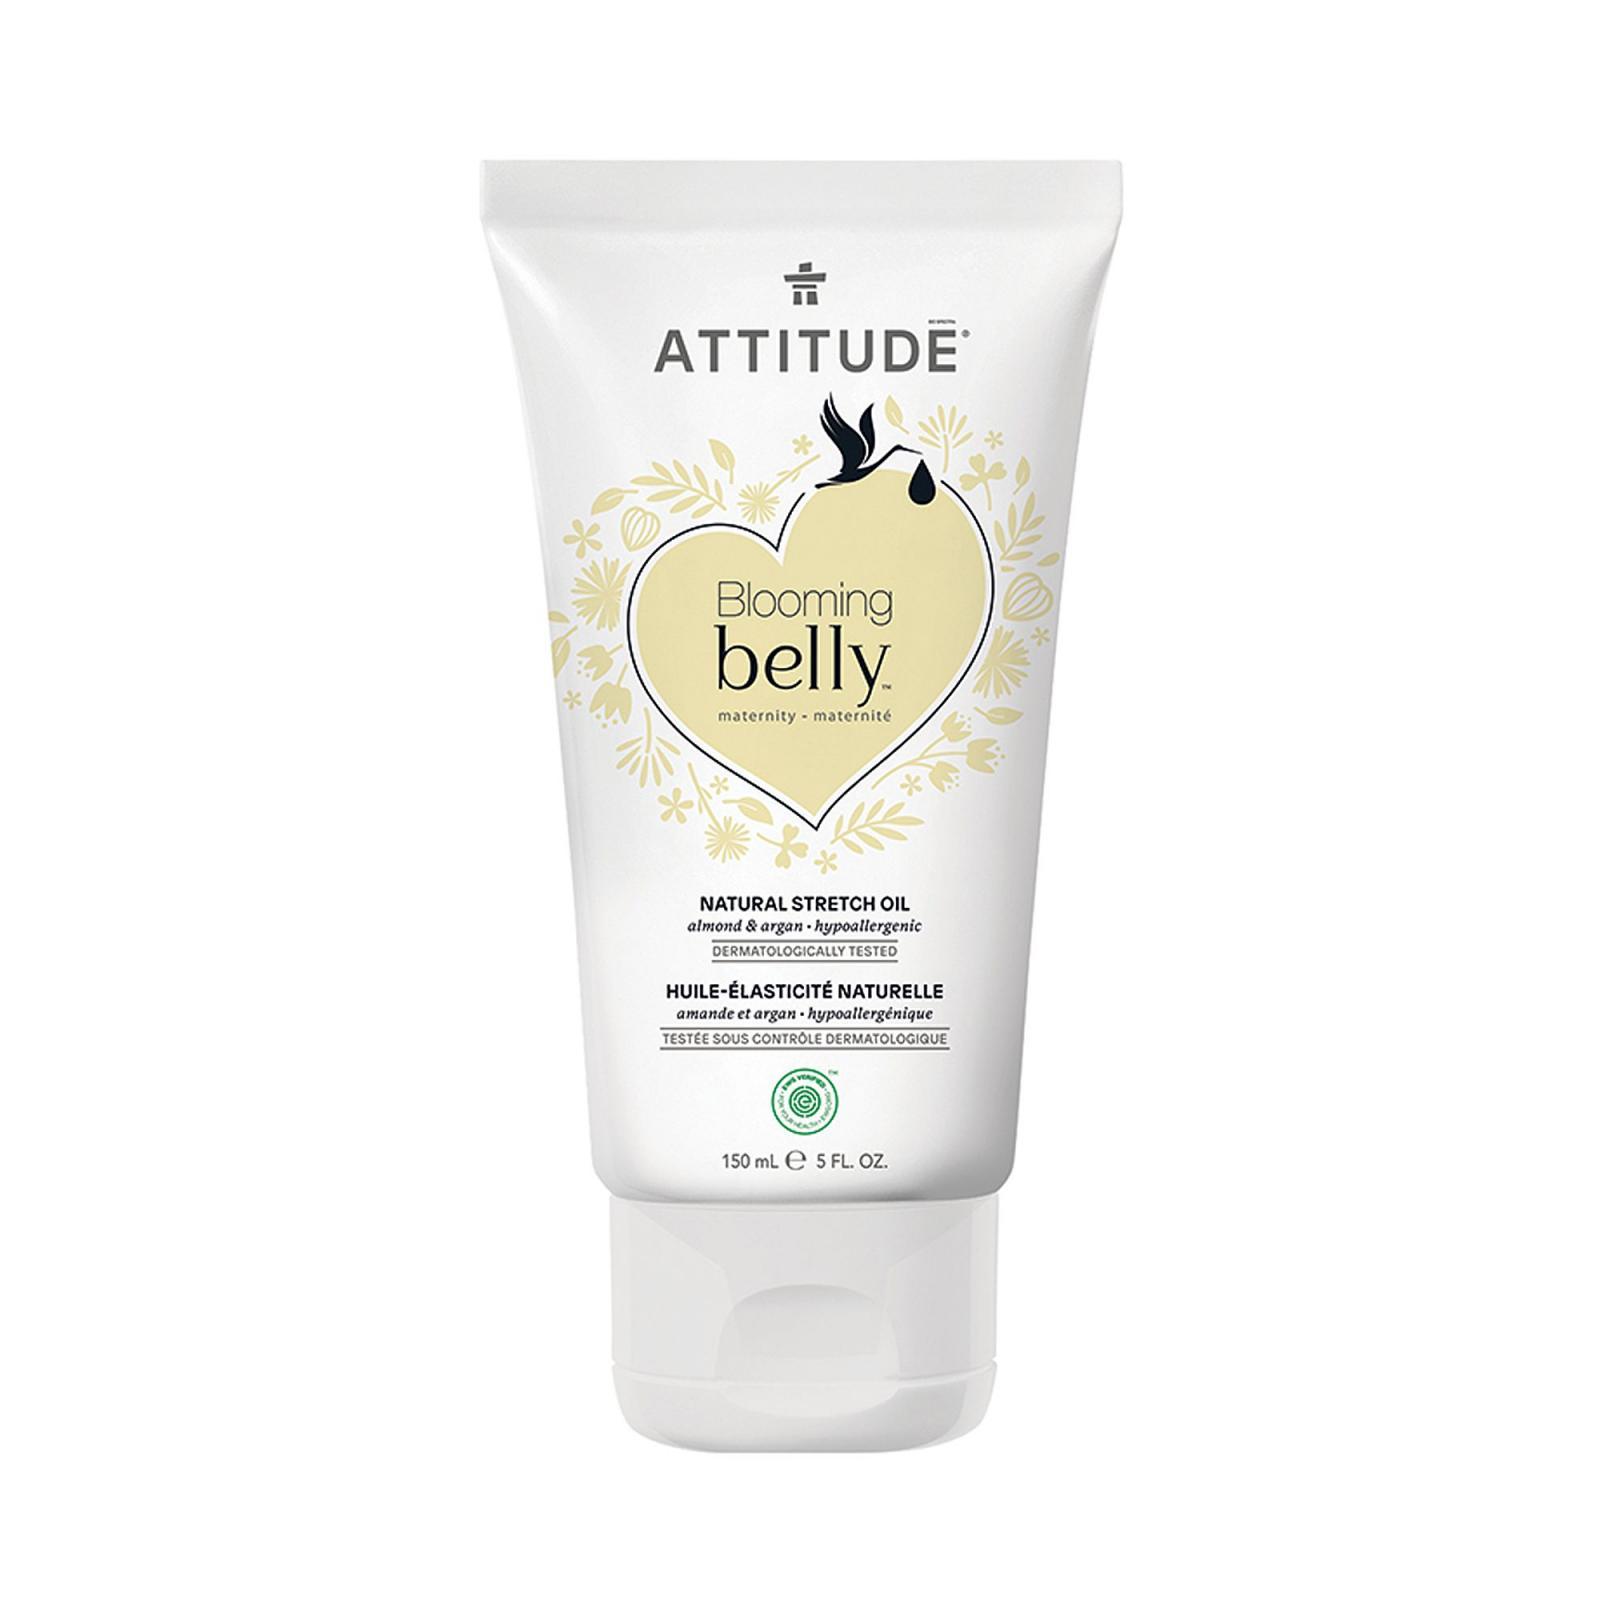 Attitude Olej pro těhotné a po porodu s arganem a mandlí, Blooming Belly 150 ml